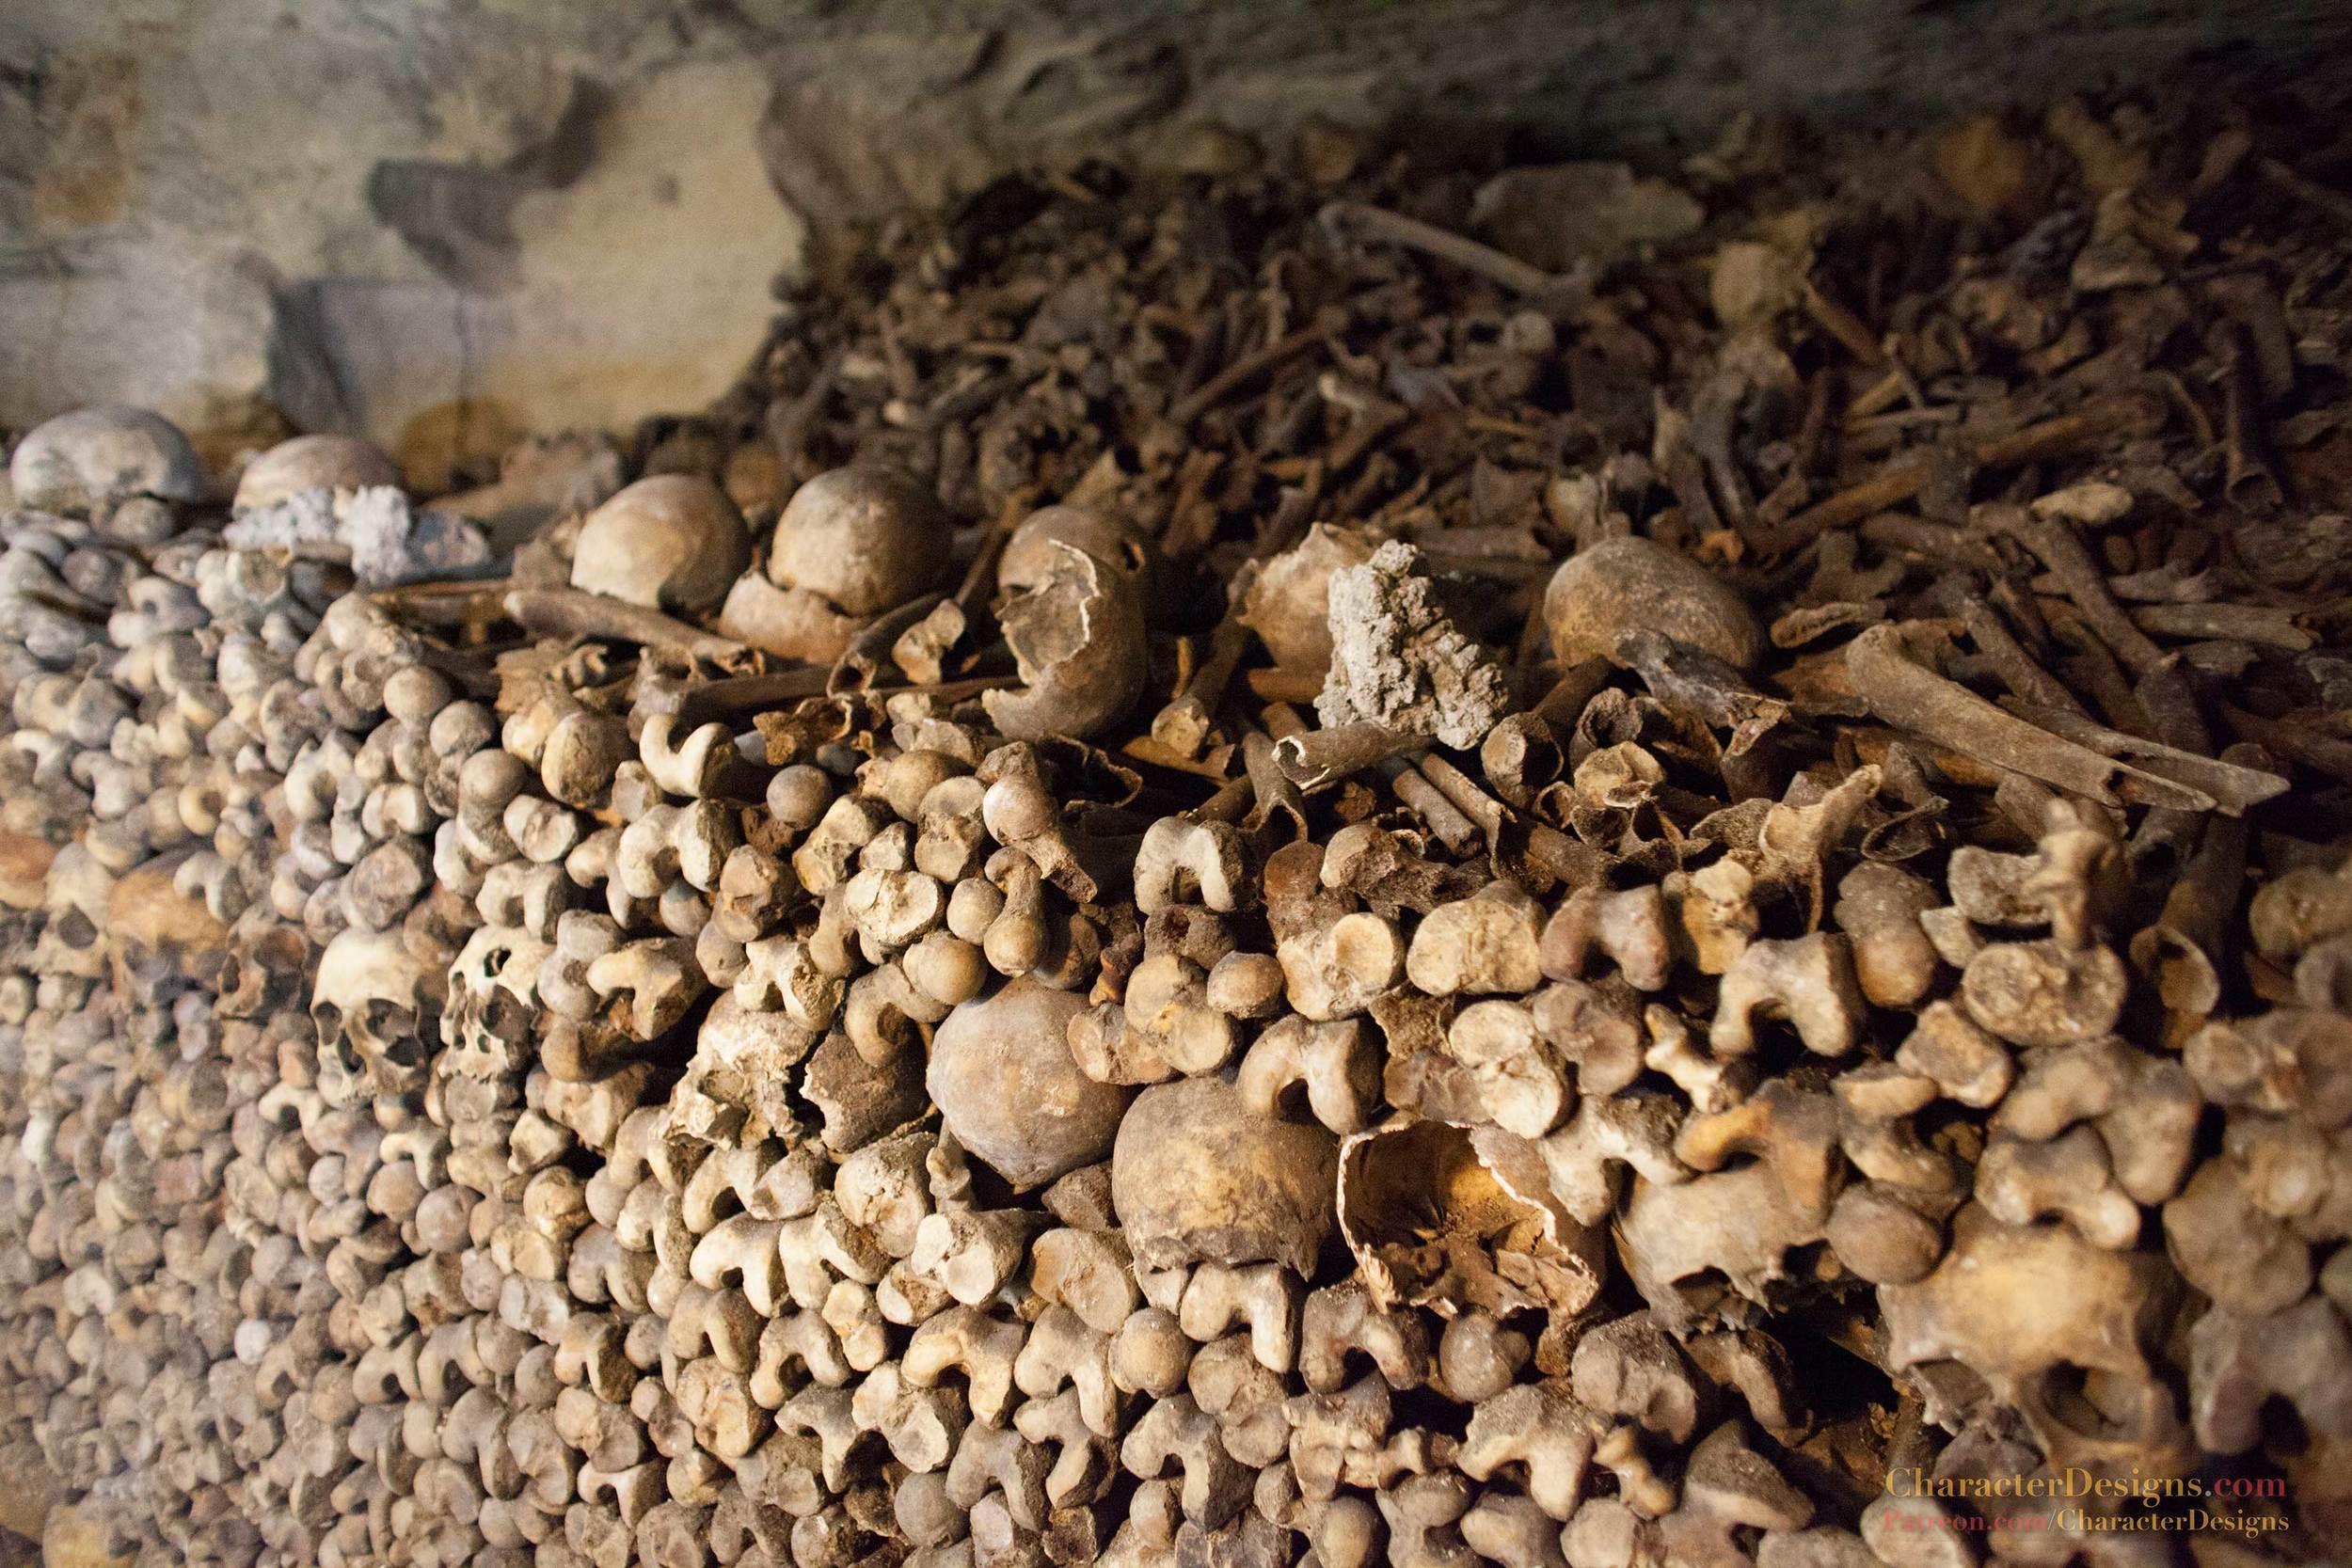 Catacombs_056.jpg